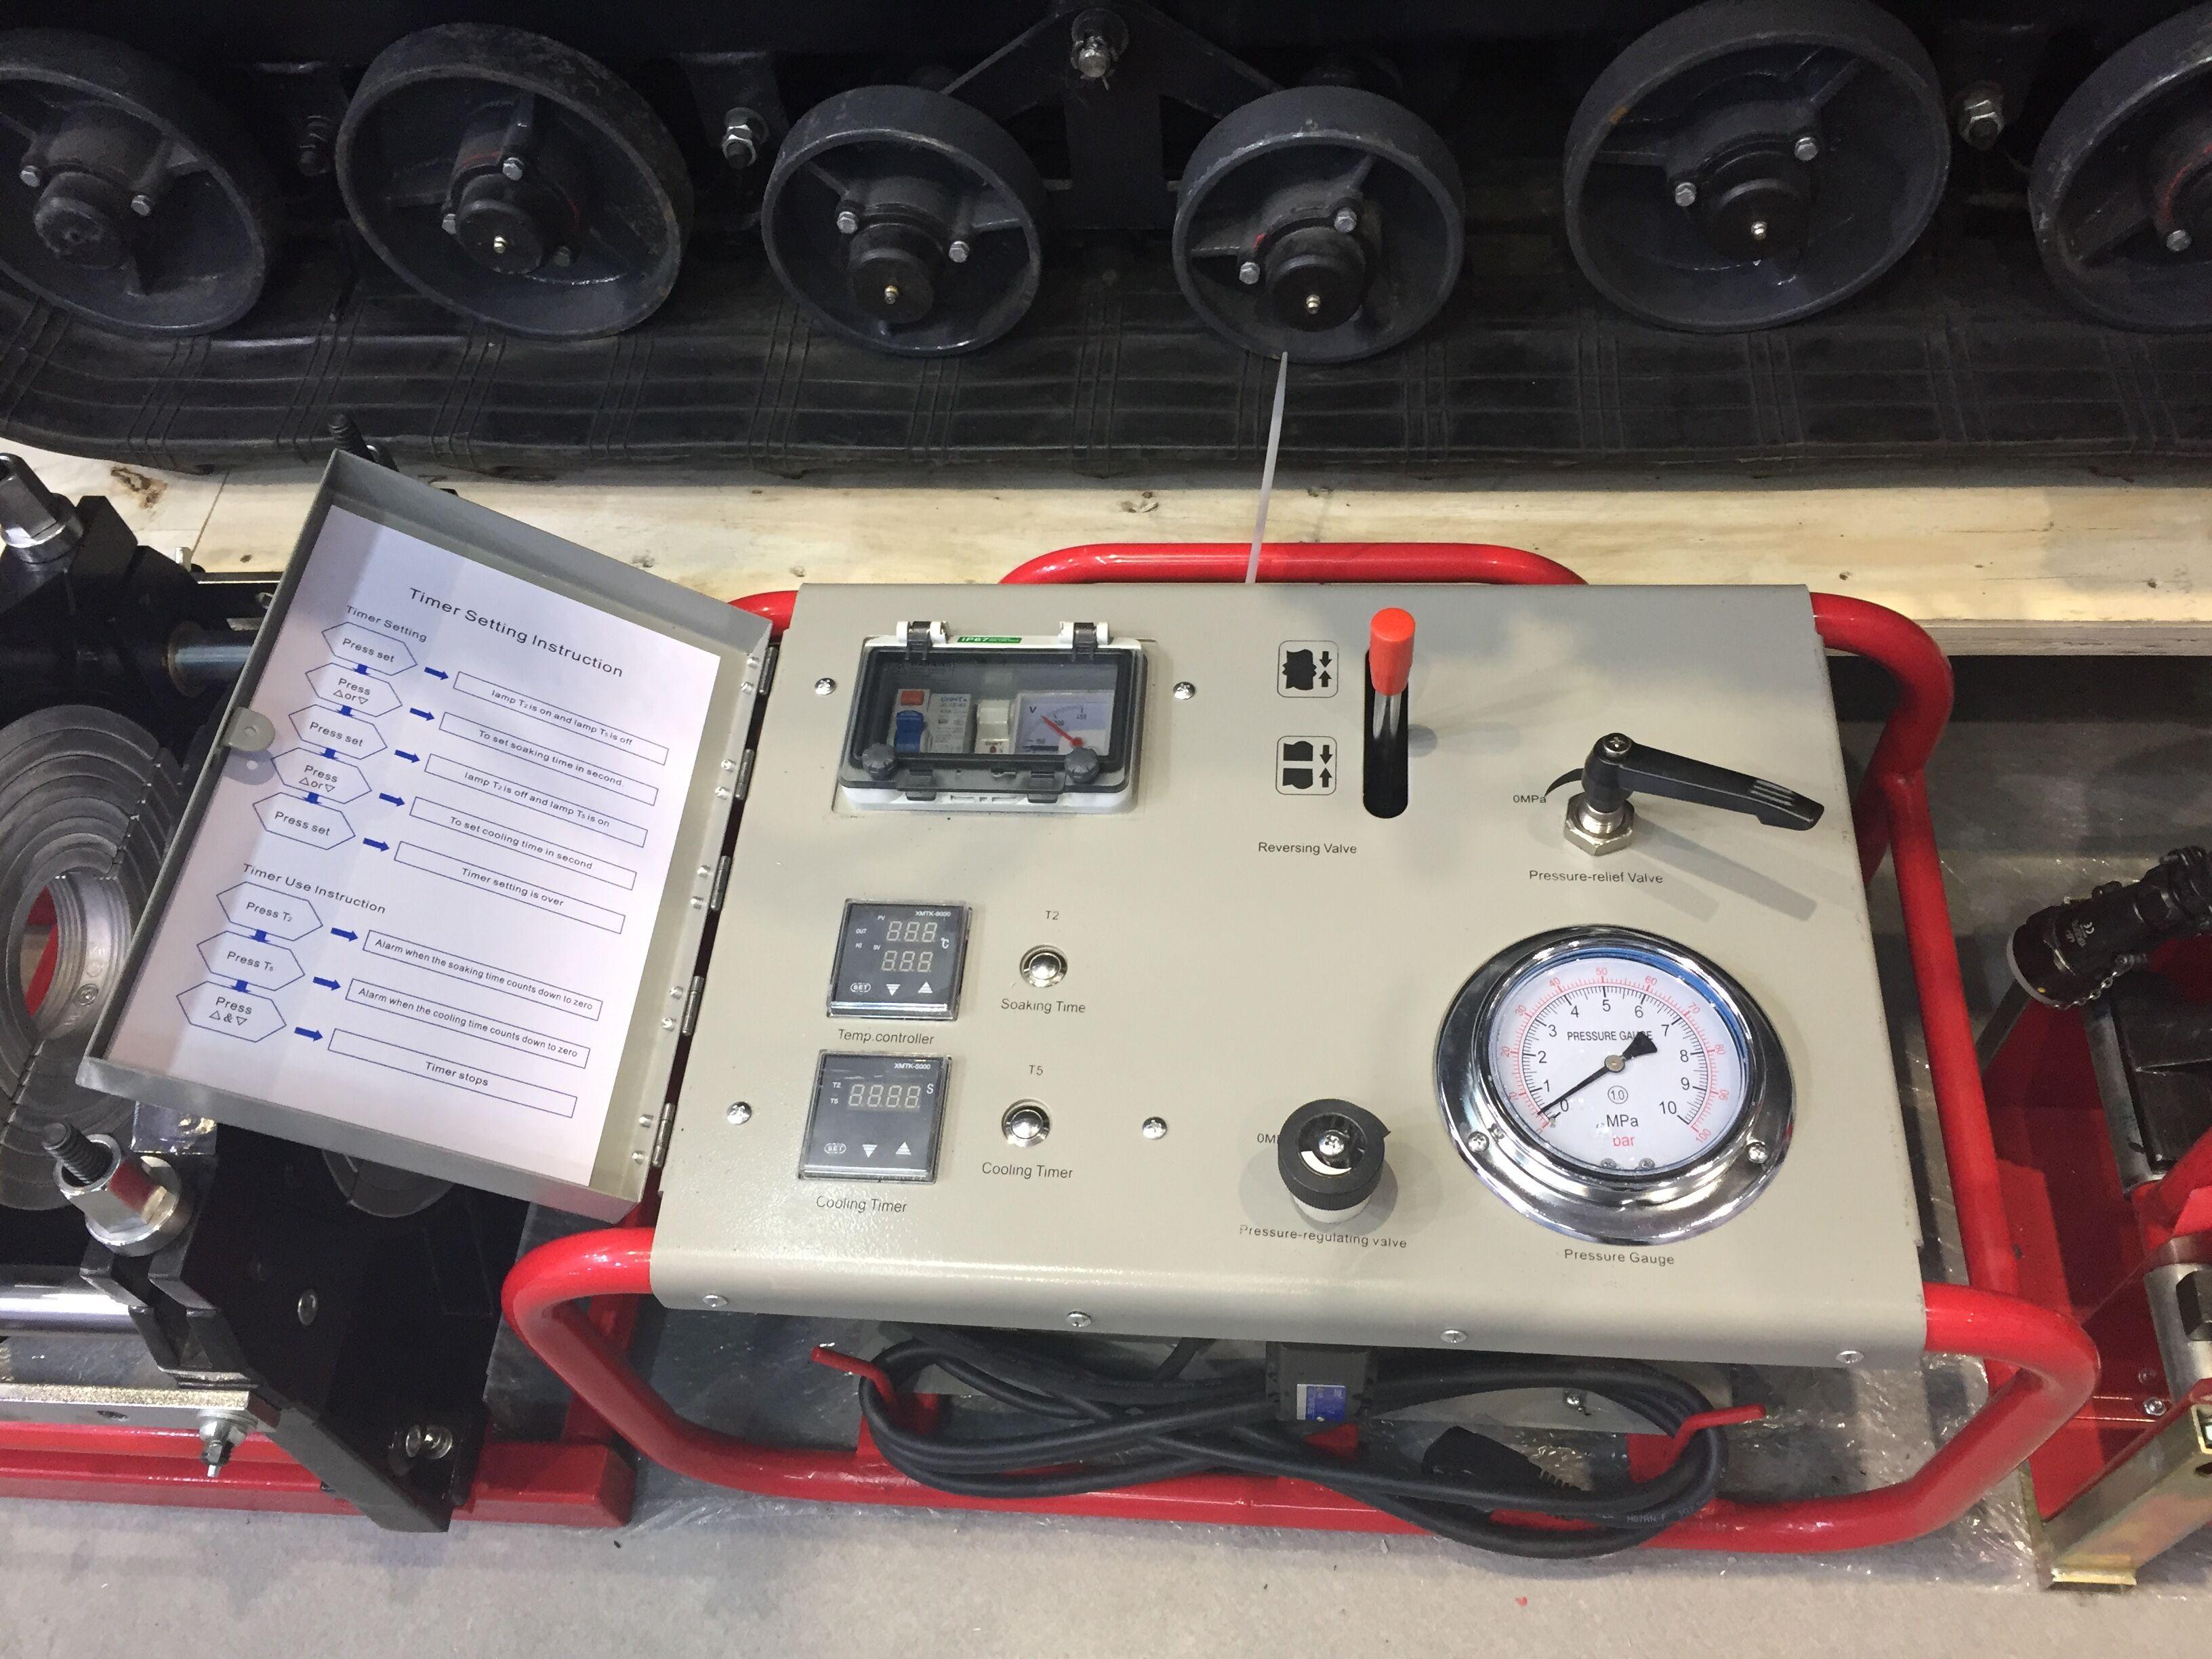 SDD250 Thermofusion pijp lassen machine voor hdpe lassen